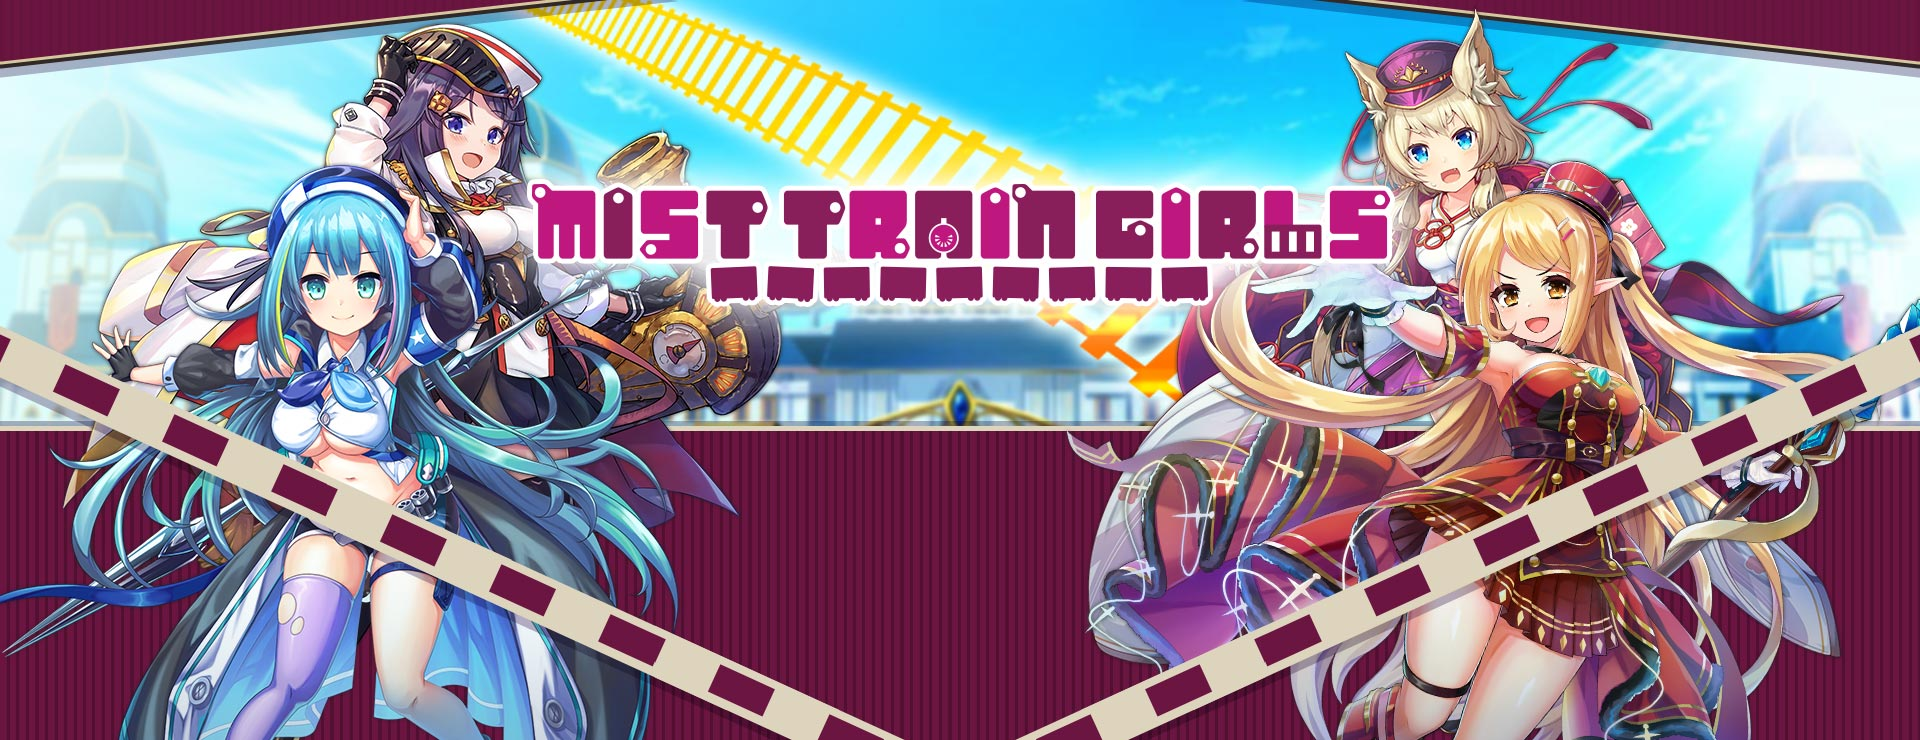 Mist Train Girls - アクションアドベンチャー ゲーム